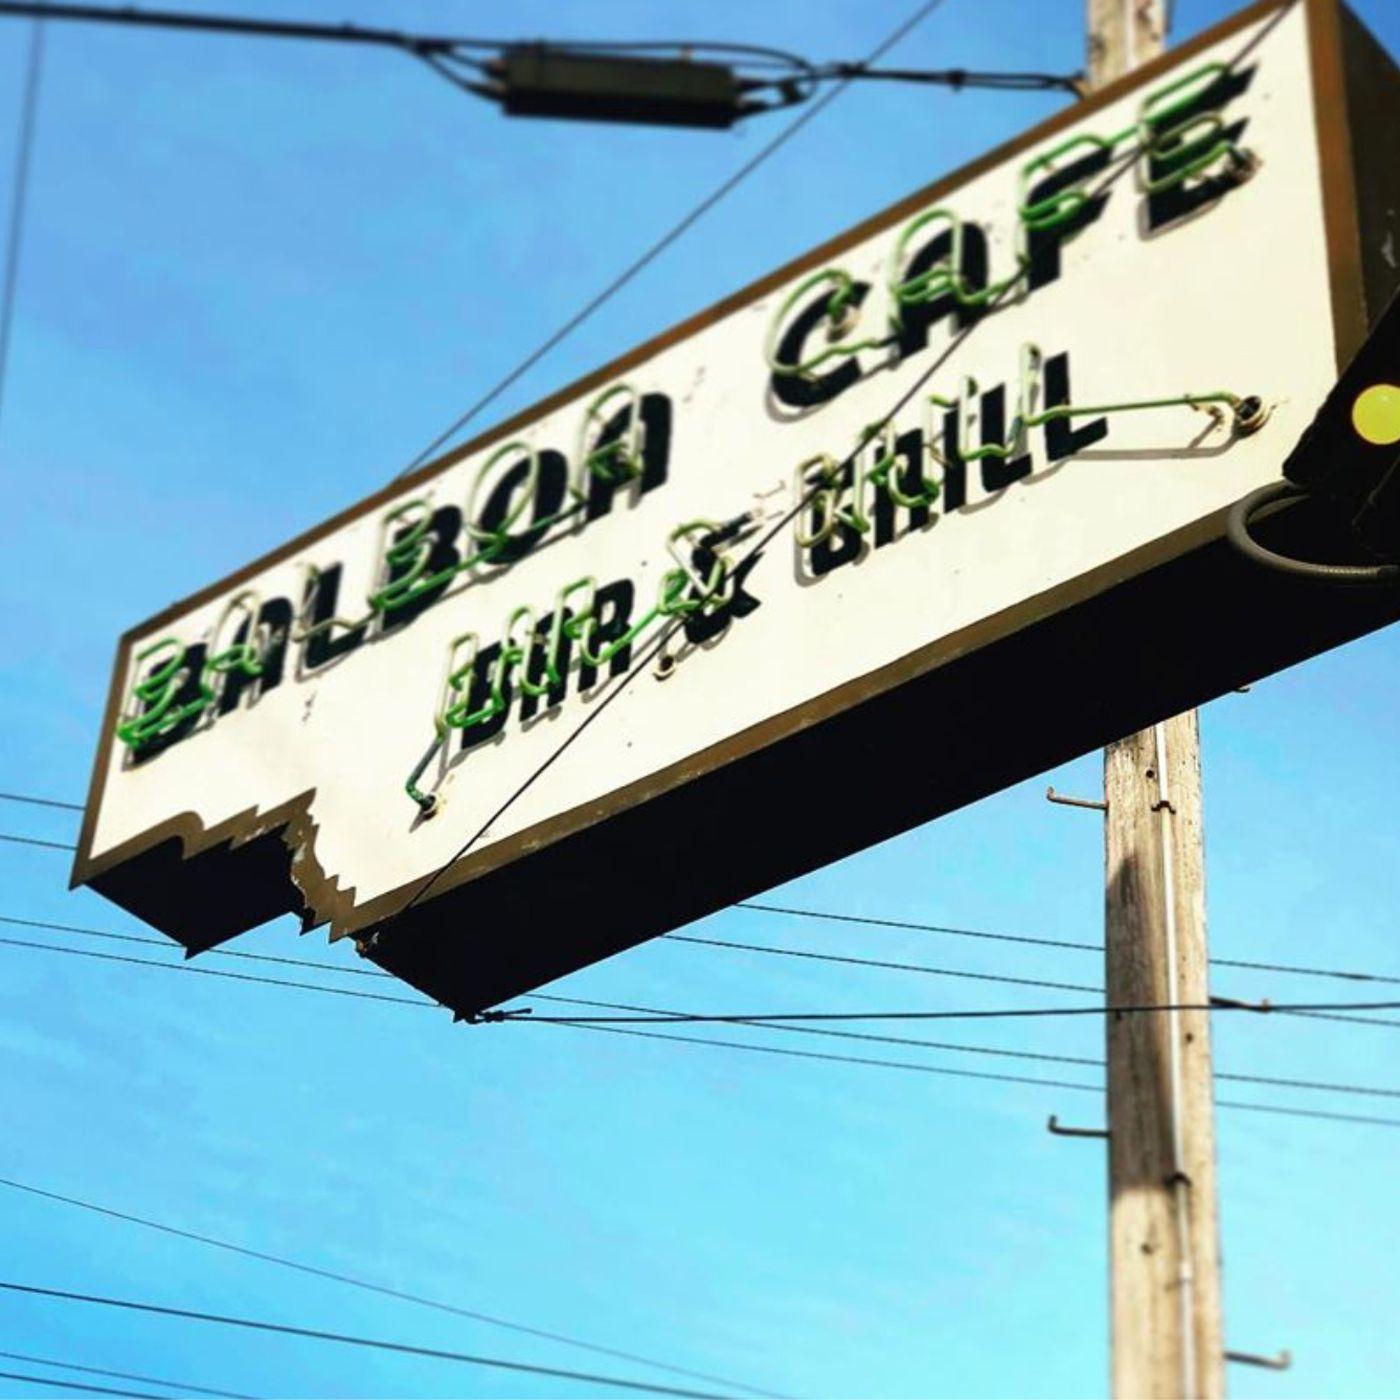 eater.com - Eve Batey - Gavin Newsom's Restaurant Group Nabbed a Six-Figure Federal Stimulus Loan